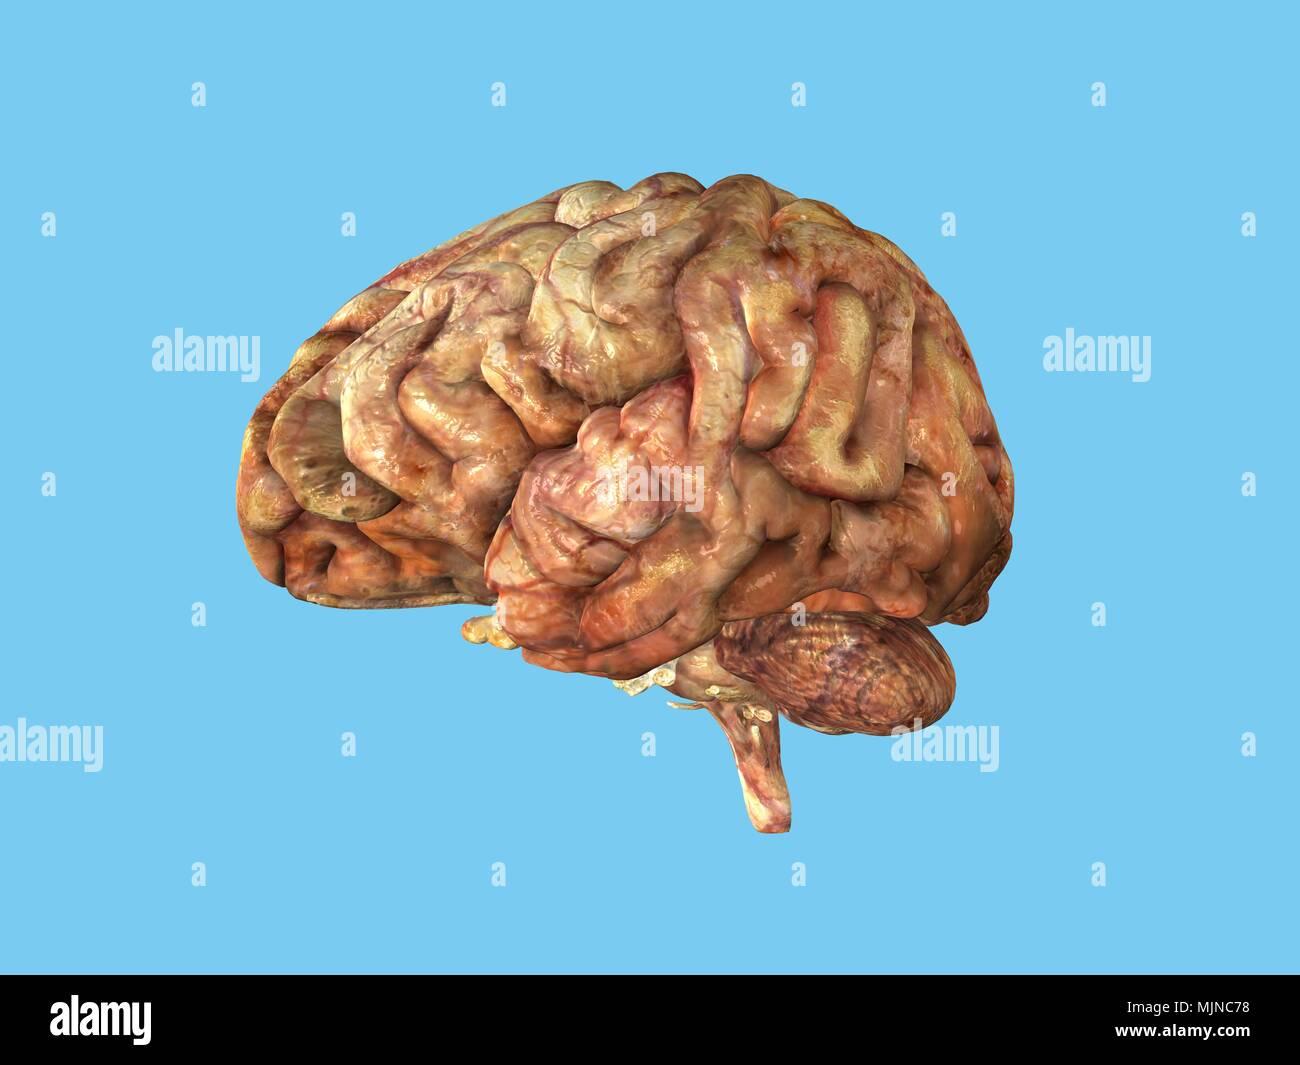 Human Brain -compromised health - Stock Image